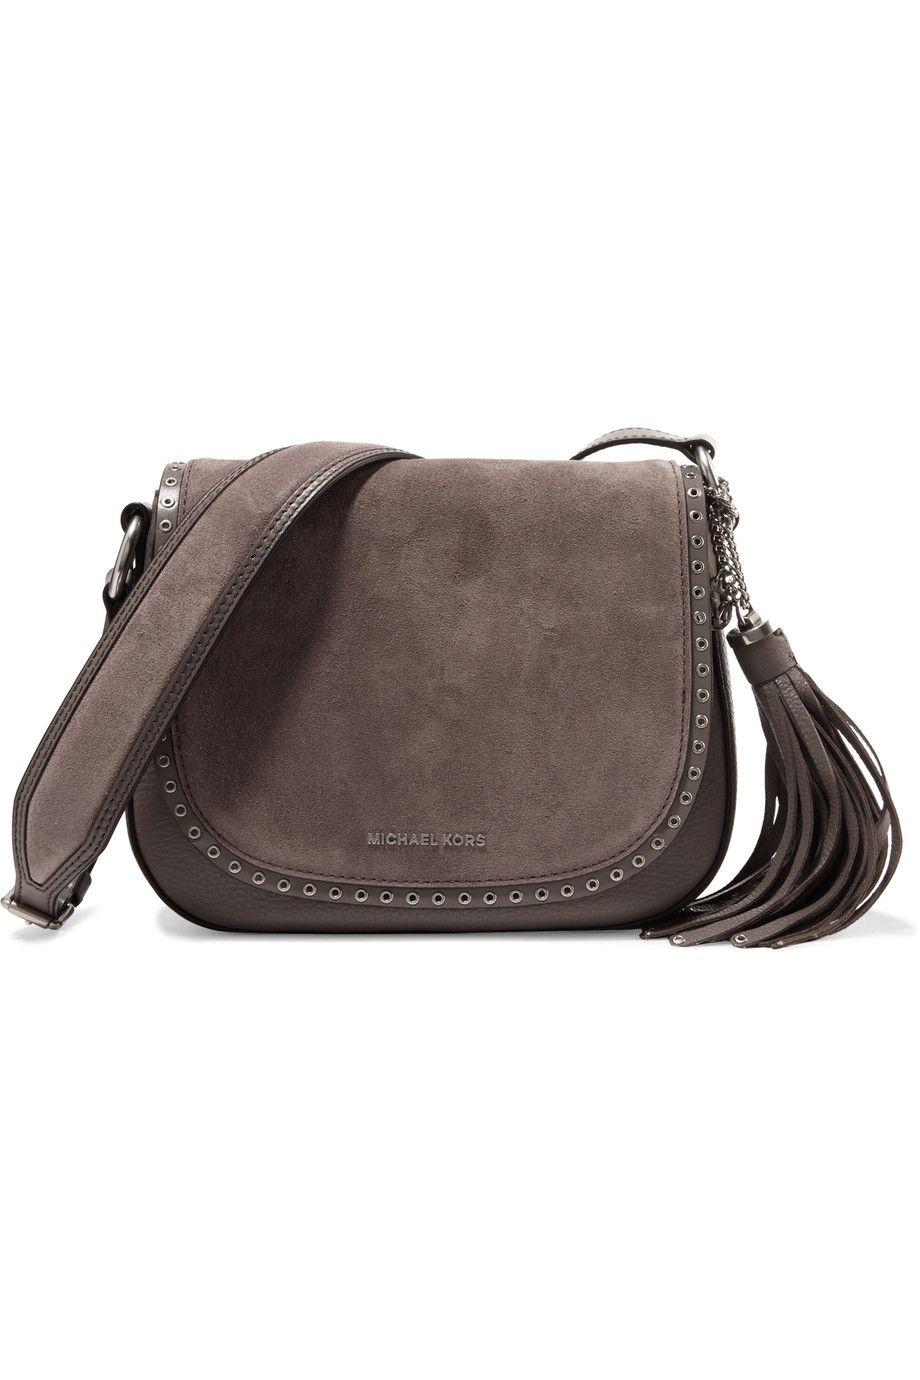 eff2cb8b1705 Shop on-sale MICHAEL Michael Kors Brooklyn embellished suede and  textured-leather shoulder bag. Browse other discount designer Shoulder Bags    more on The ...